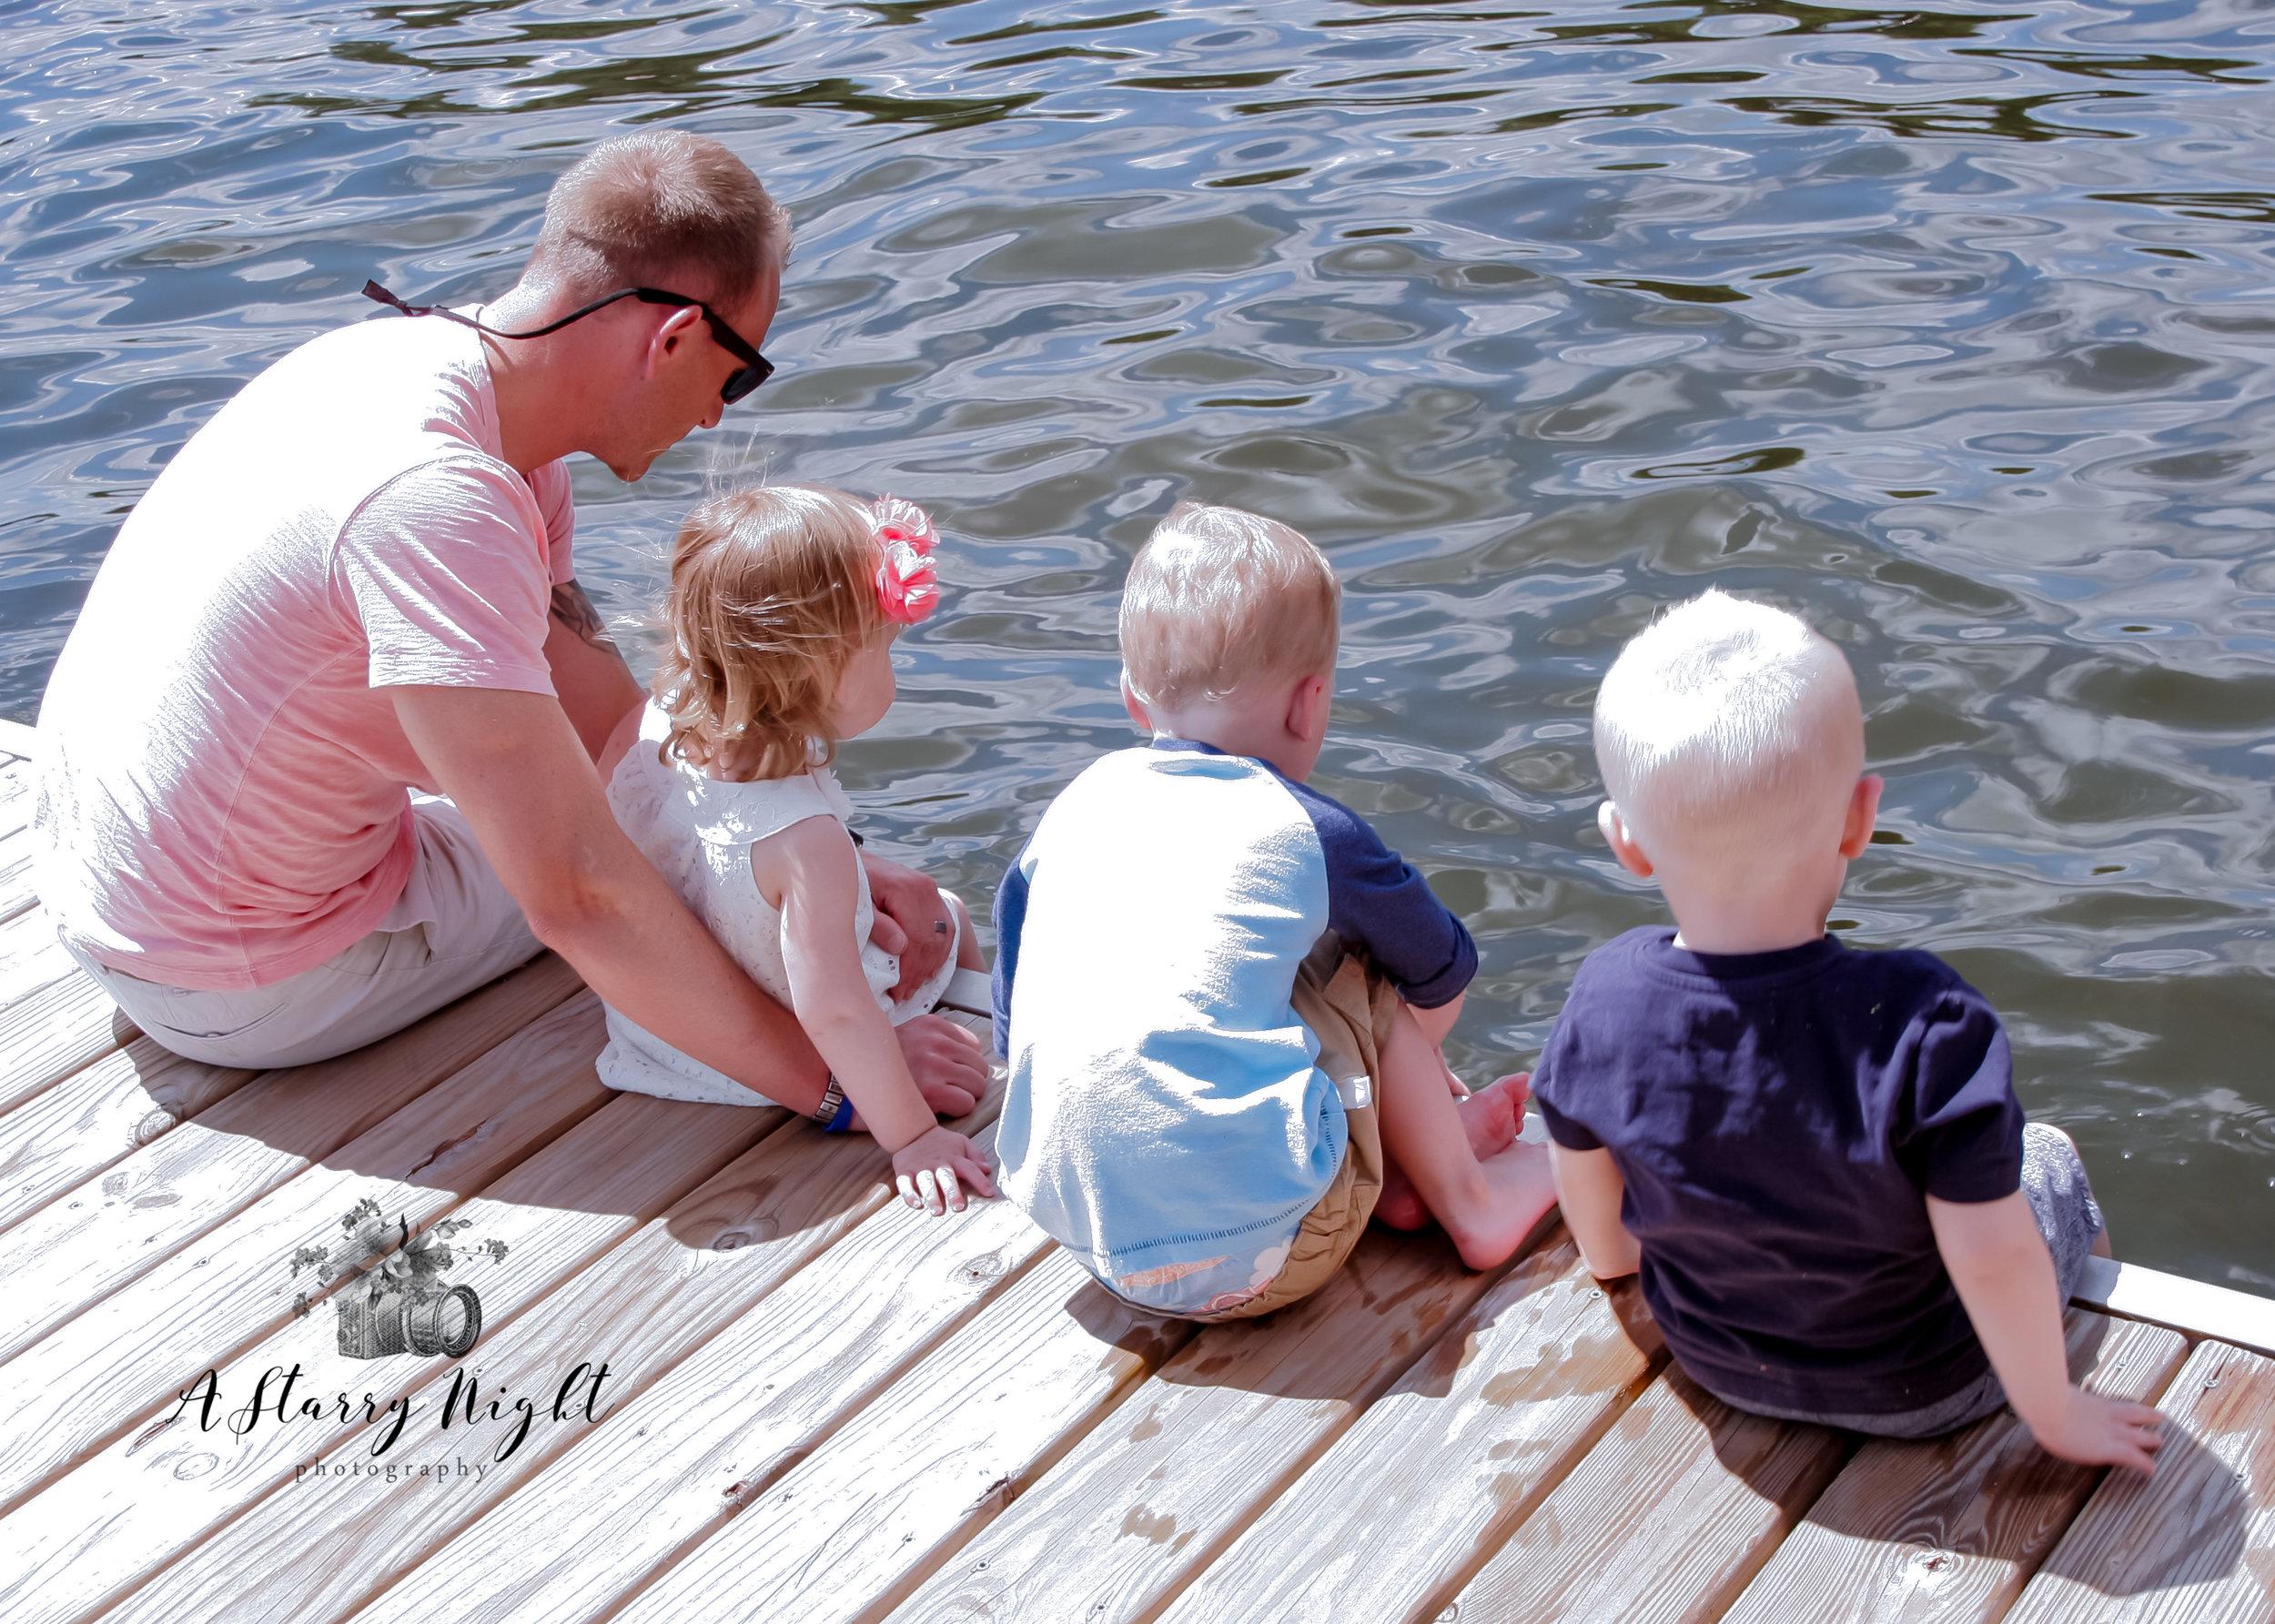 Thietten-Family-Lifestyle-Session-Farwell-Lake-13-7.jpg